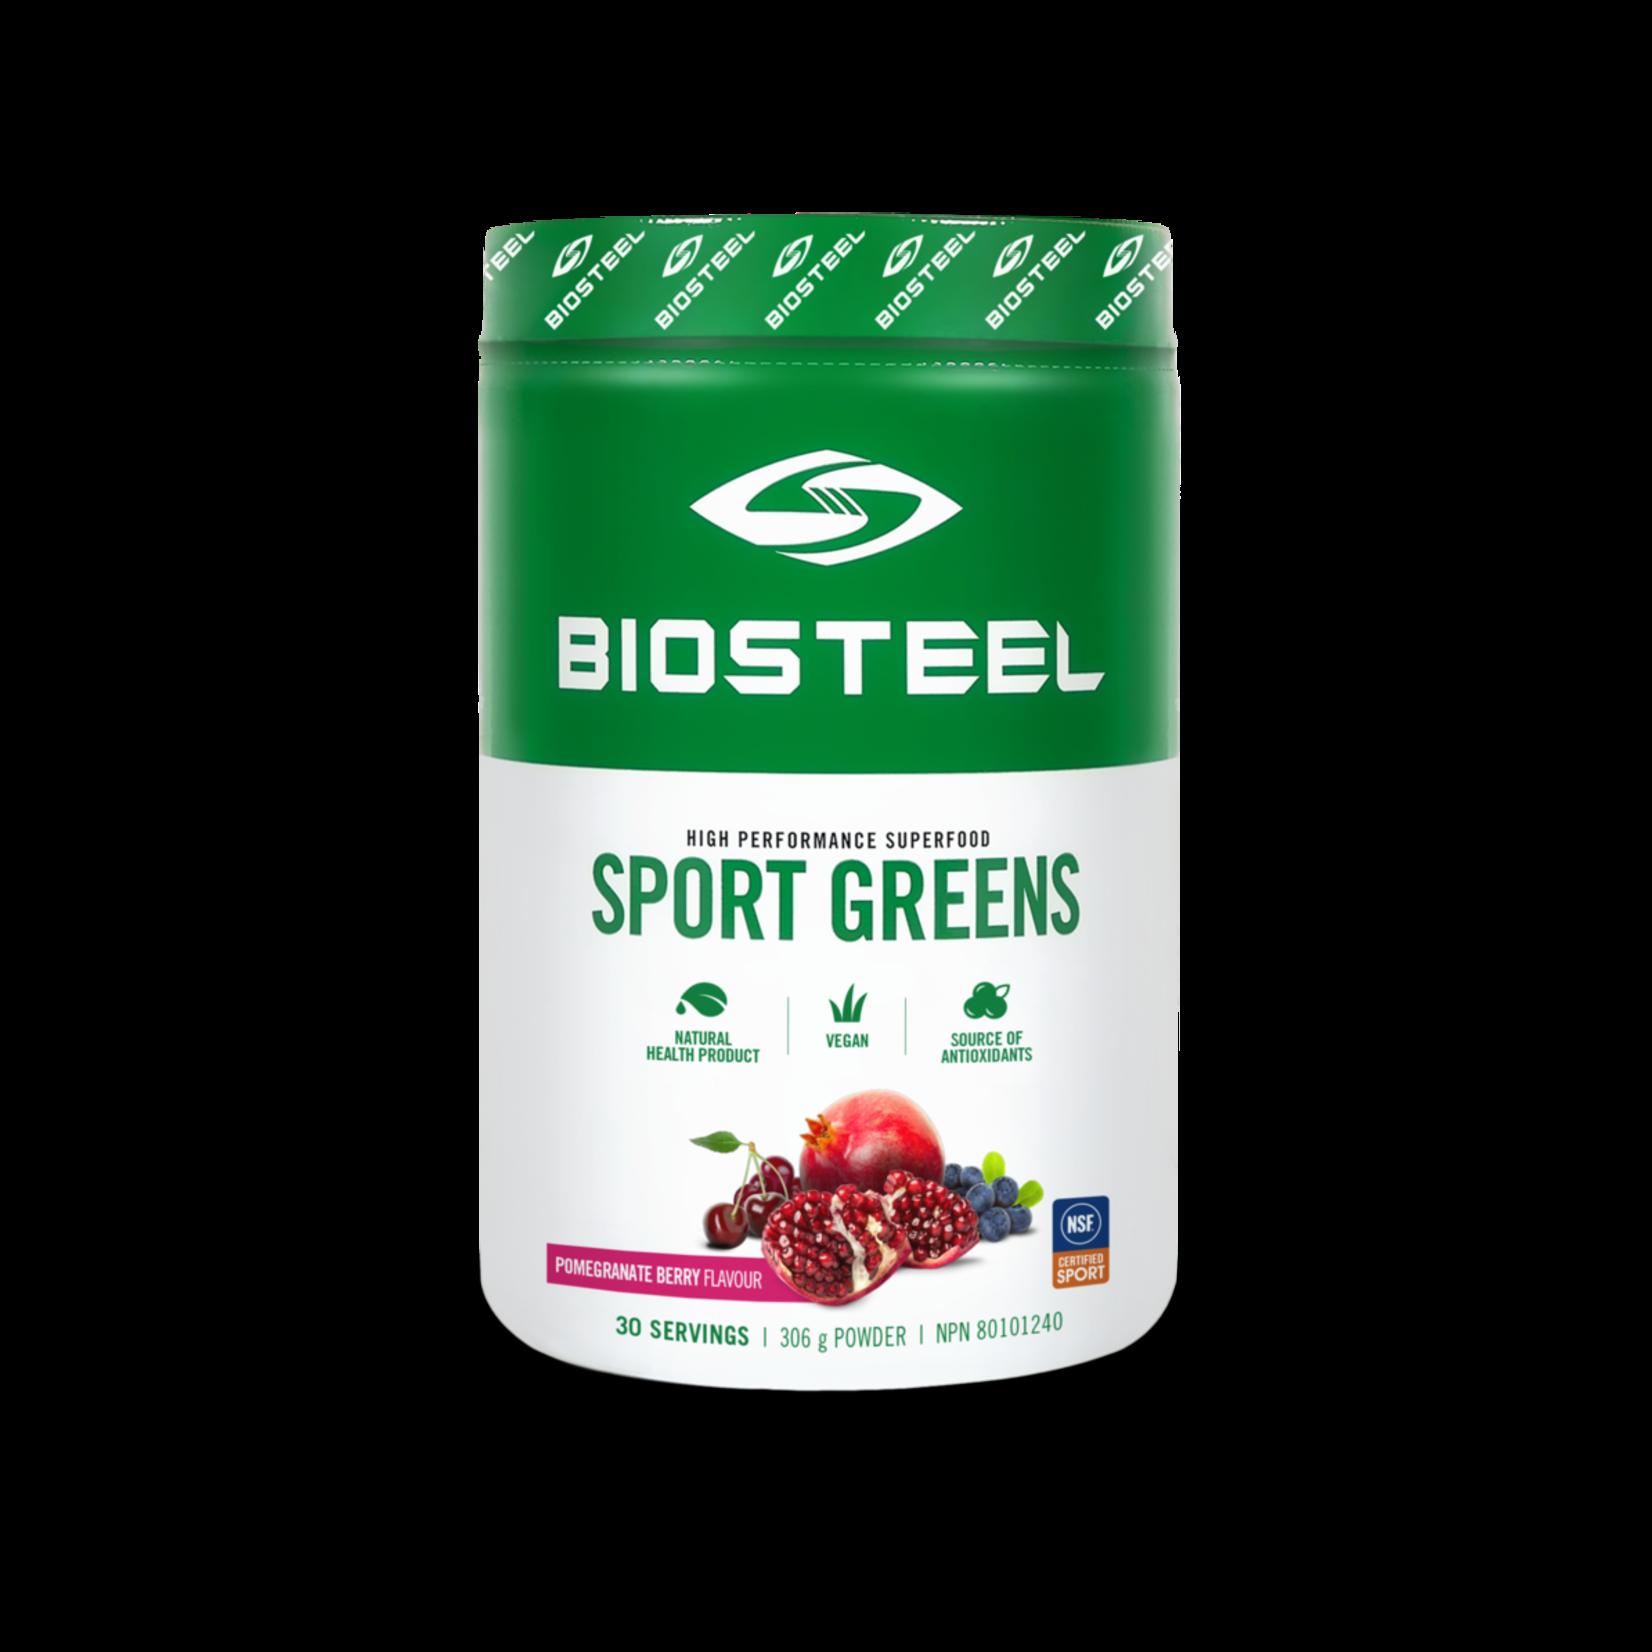 BioSteel Biosteel Sport Greens, Pomegranate Berry, 306g